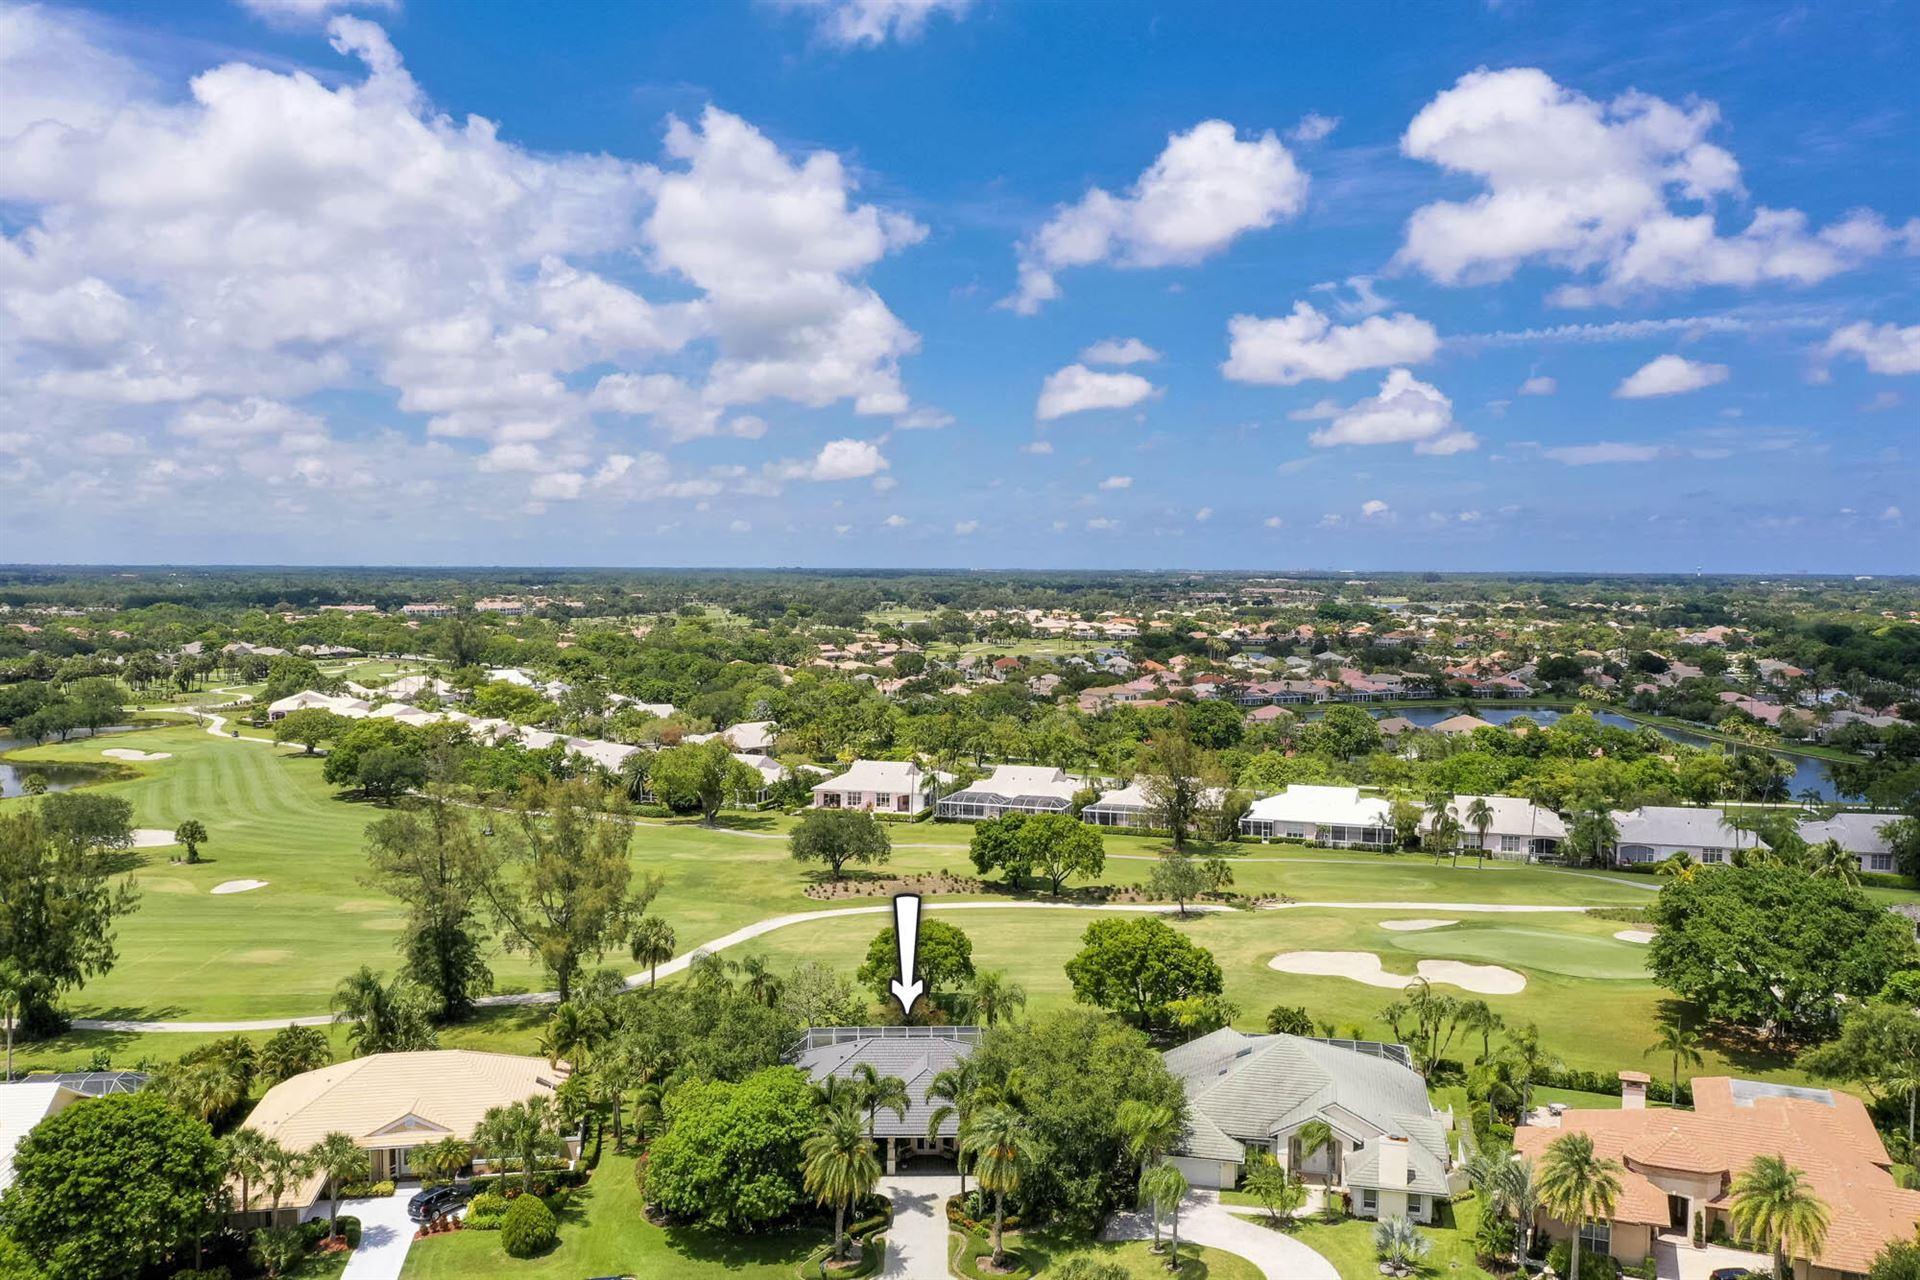 Photo of 201 Thornton Drive, Palm Beach Gardens, FL 33418 (MLS # RX-10721425)